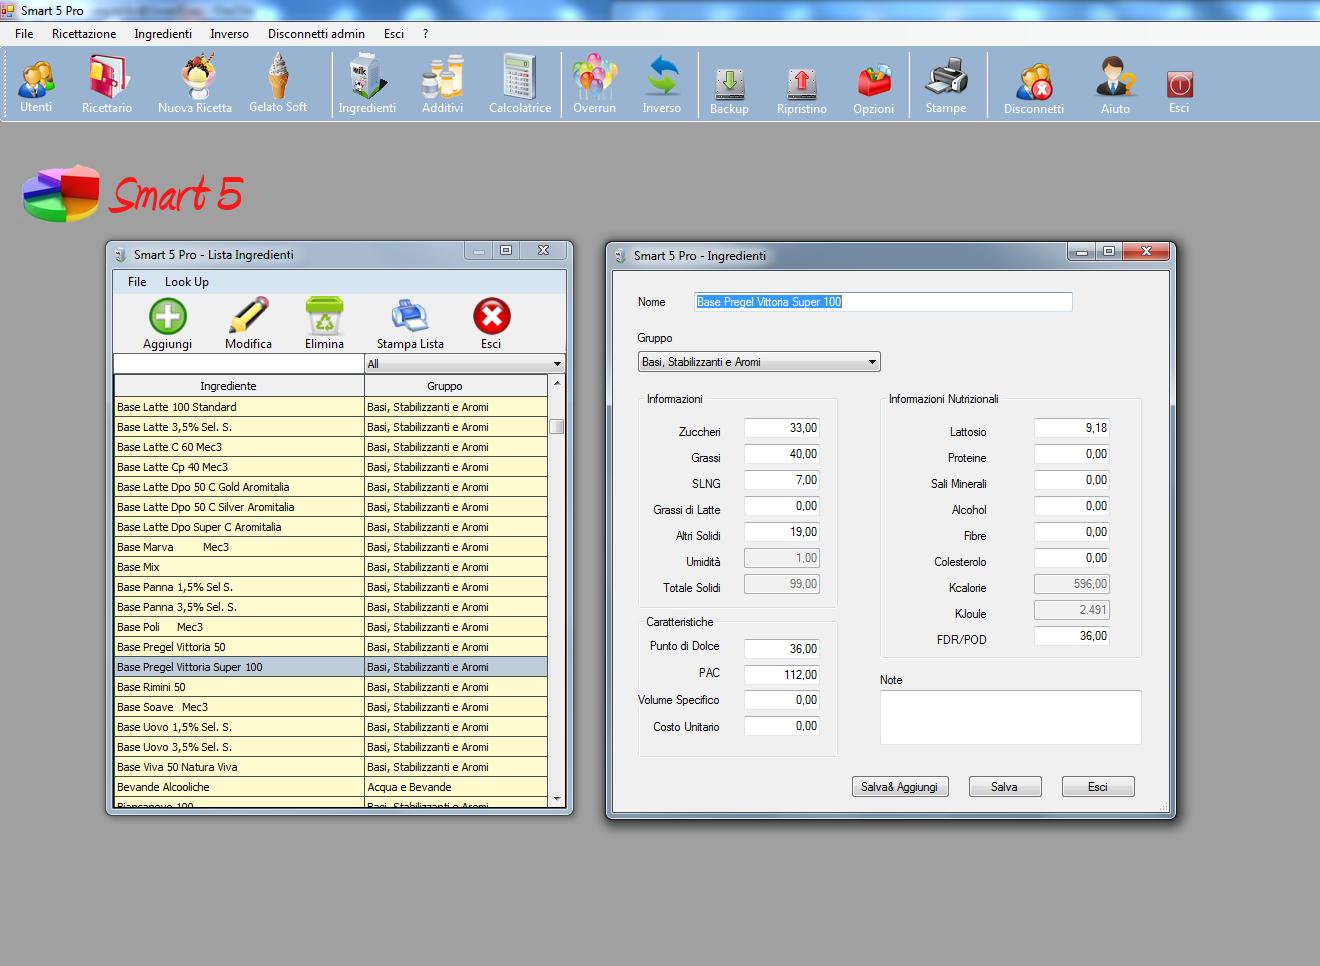 Balancing Software Icecream - Free Balancing Software